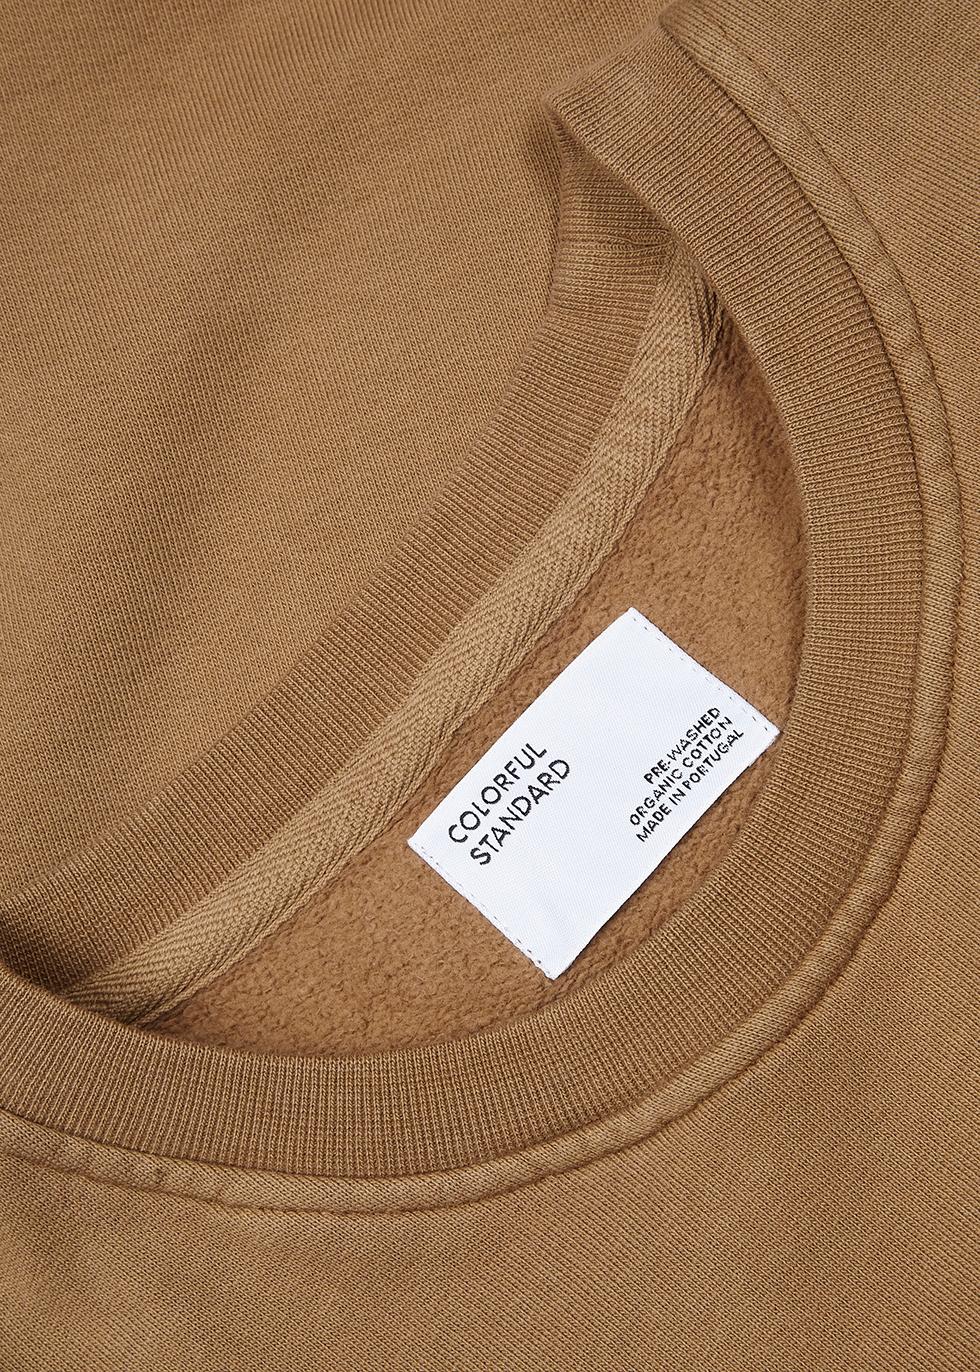 Olive cotton sweatshirt